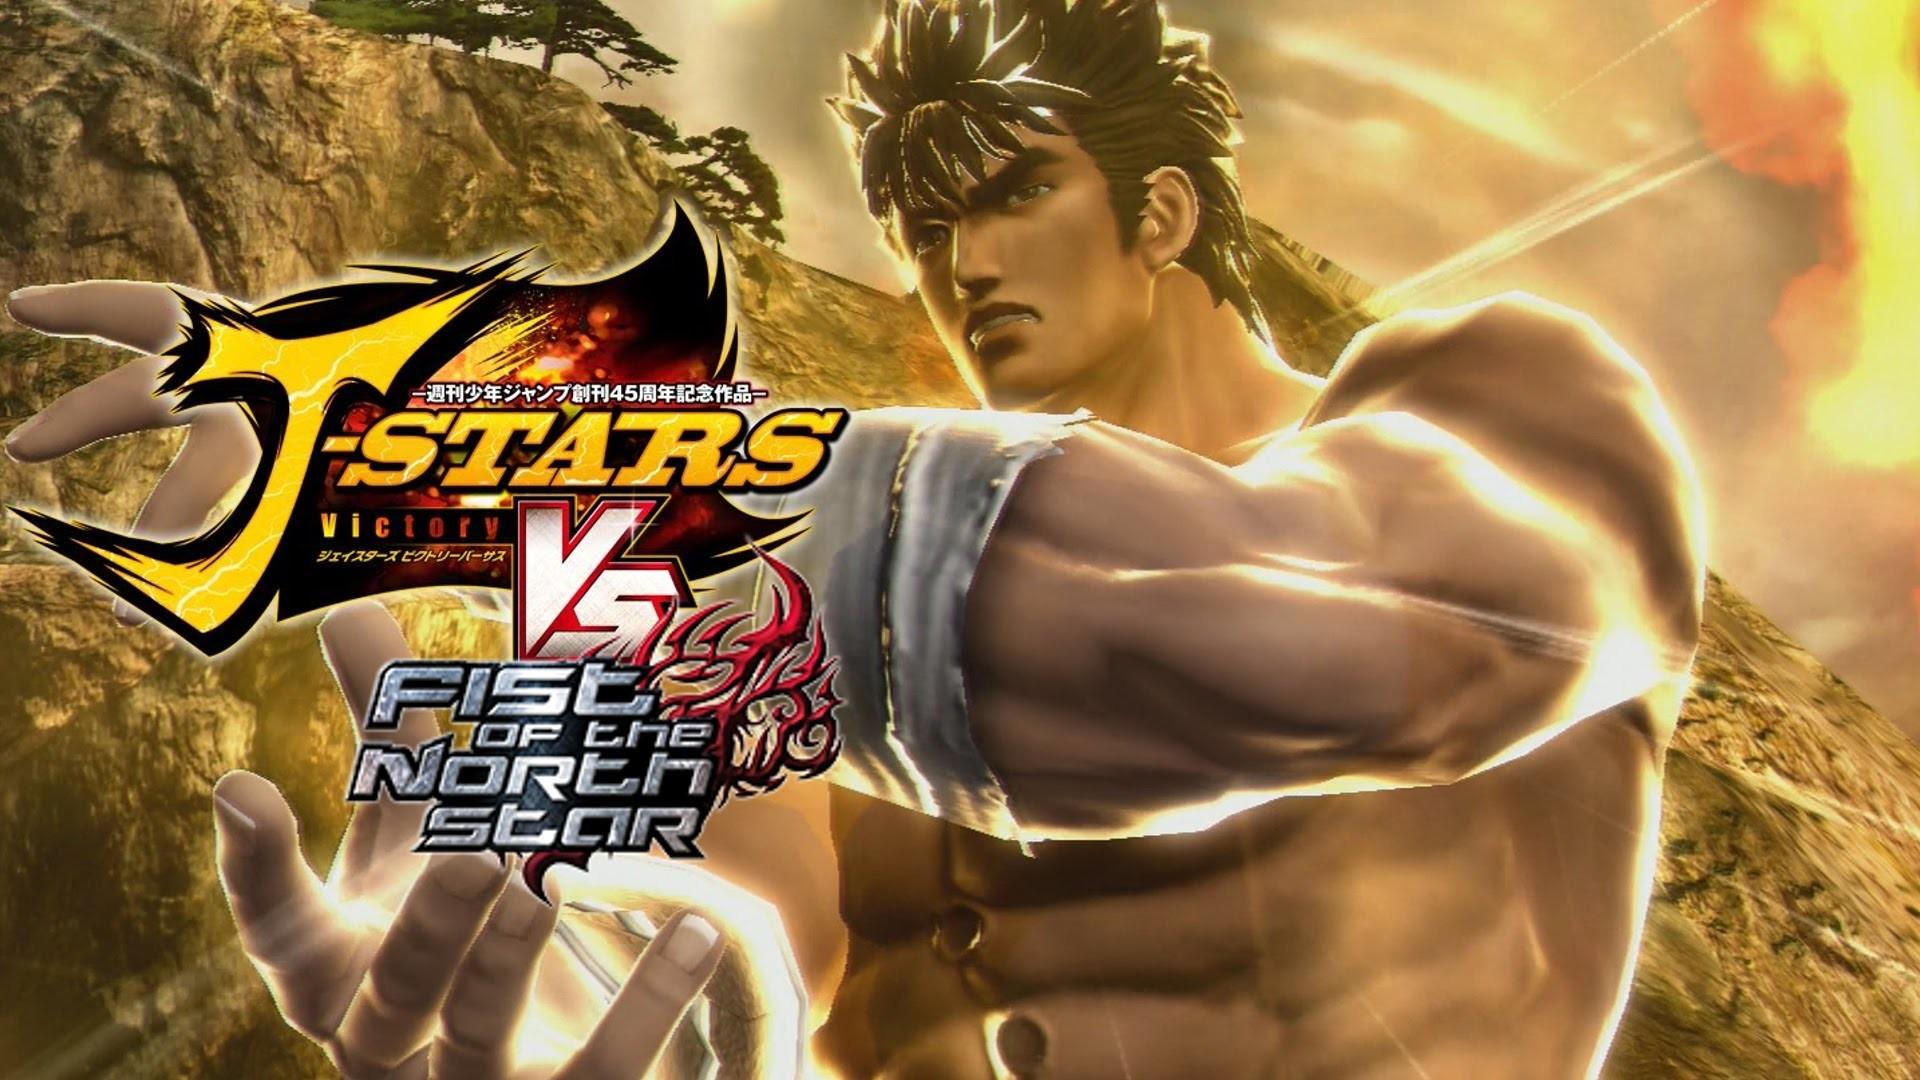 J-Stars Victory Vs – Fist of the North Star vs. JoJo's Bizarre Adventure –  YouTube